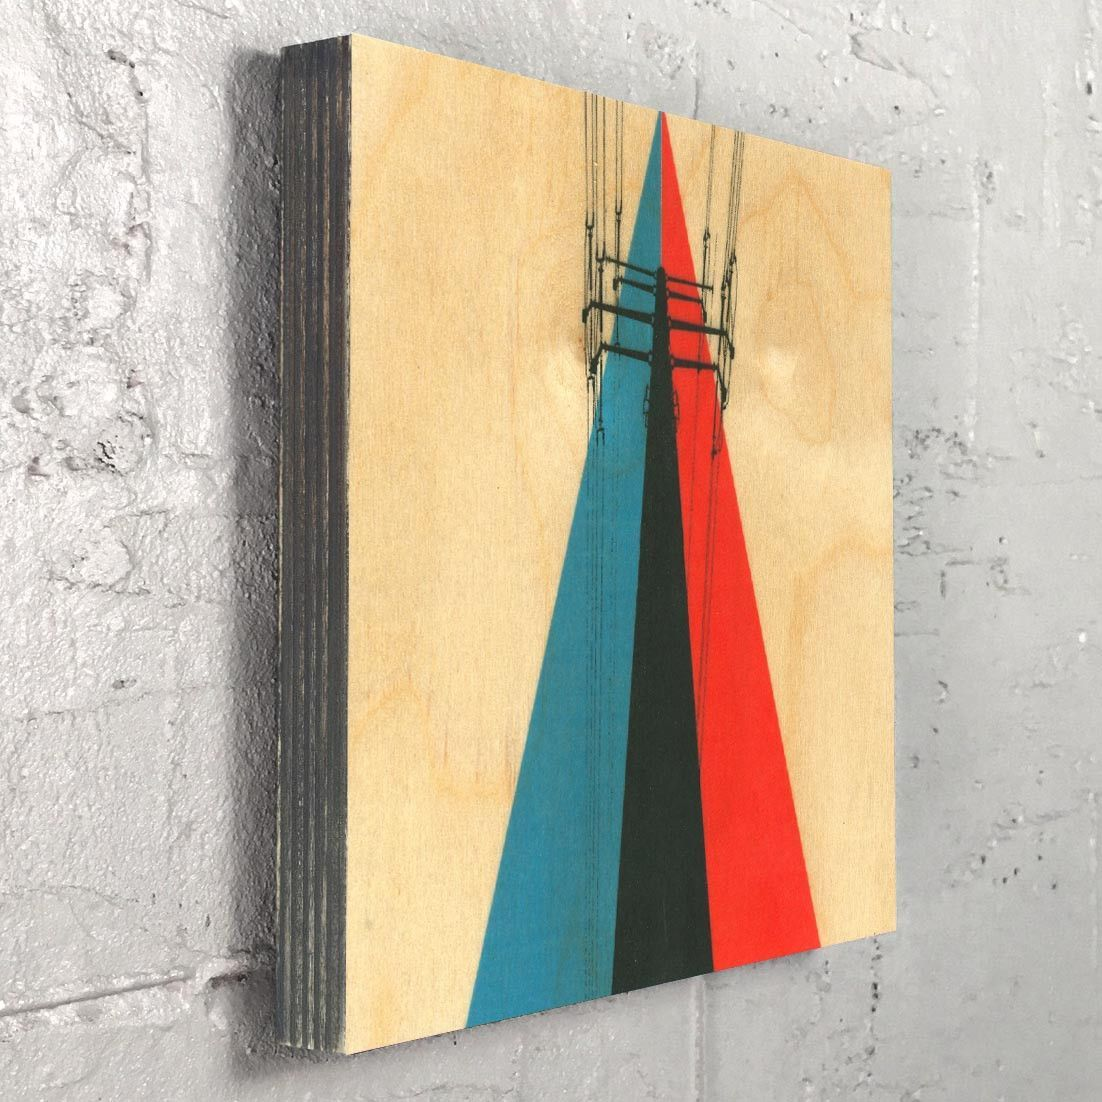 Power lines industrial urban graphic design art wall decor